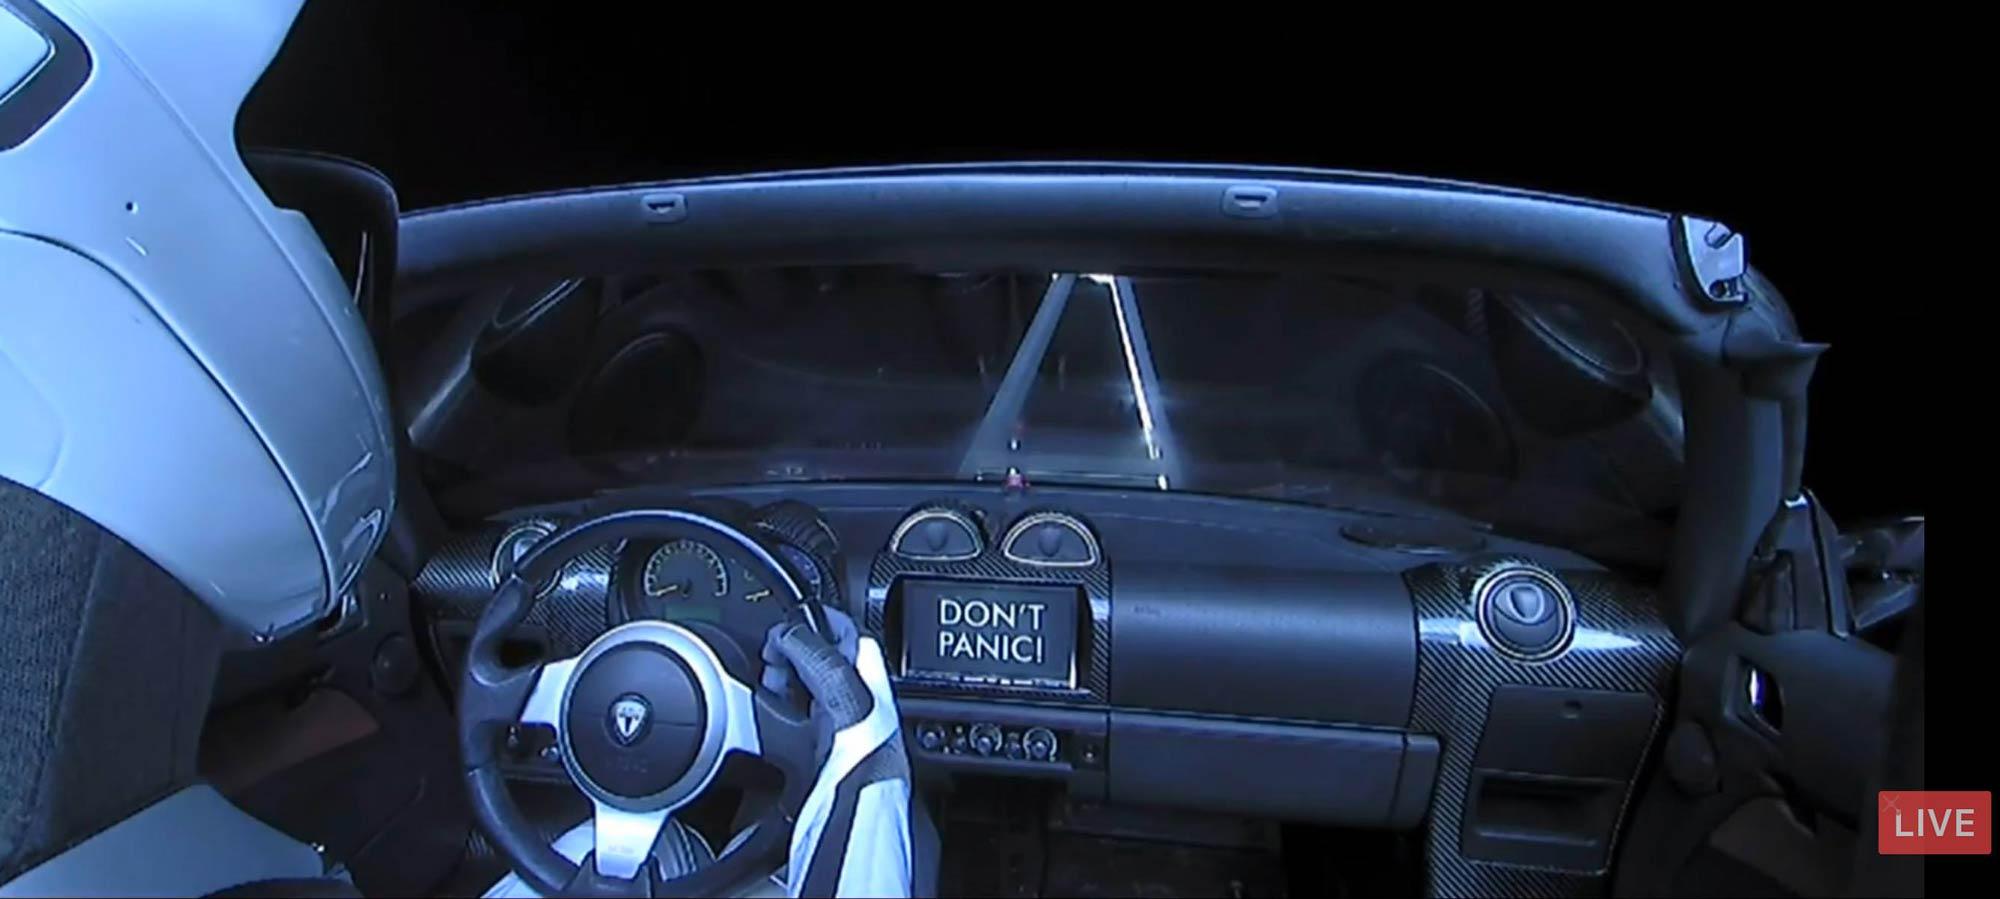 DontPanicSpace.jpg